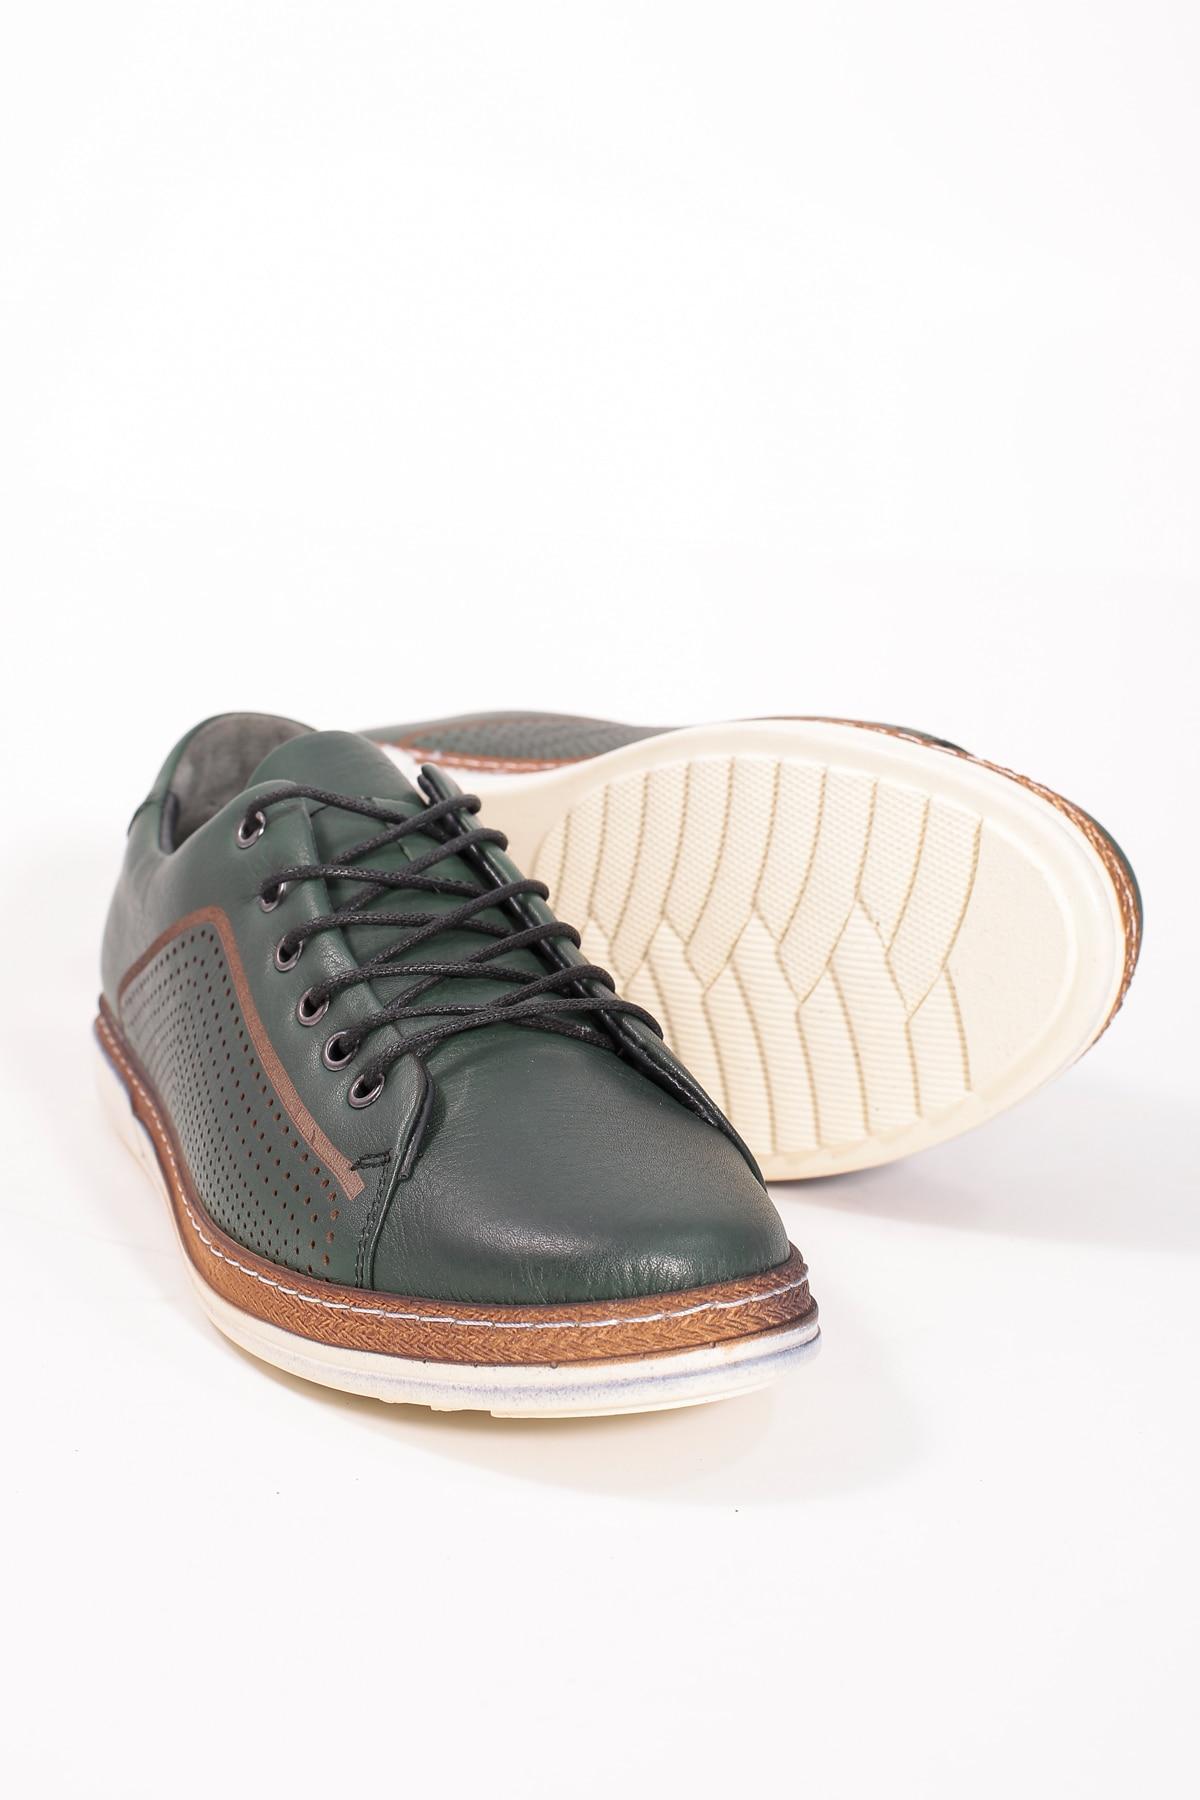 Khaki Color Lace-Up Casual Shoes casual lace up color splice skate shoes